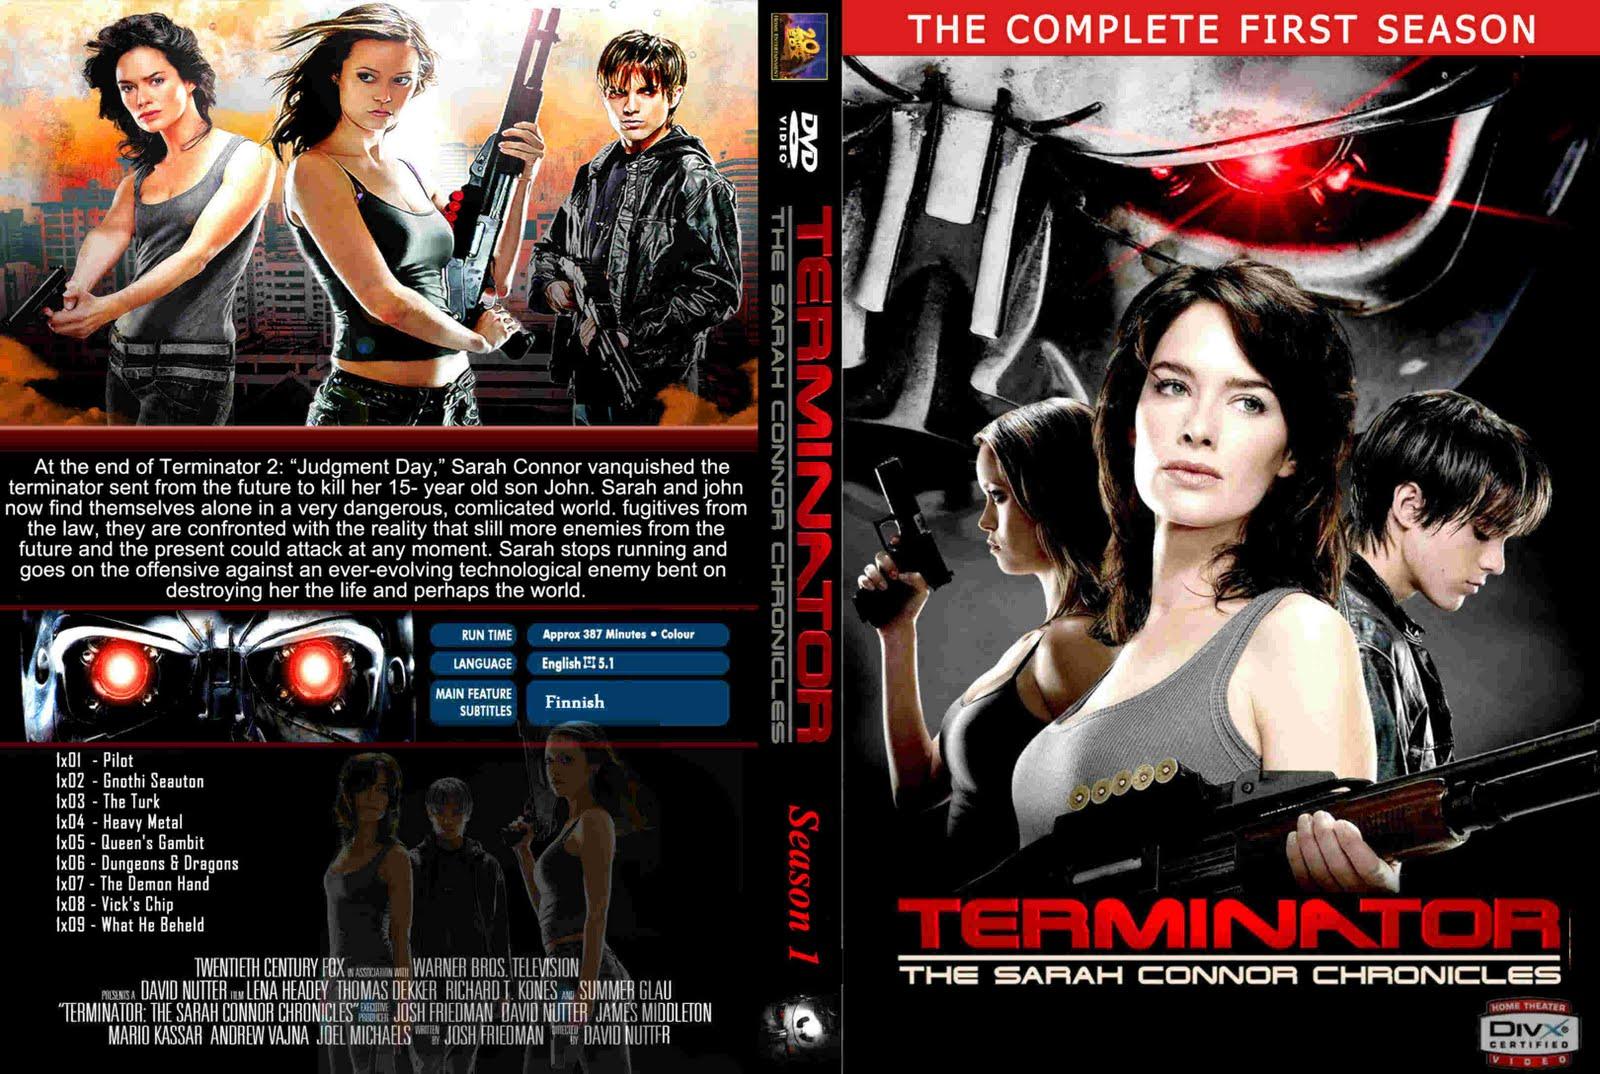 http://2.bp.blogspot.com/_FOehkNRozJE/S-RTYRMSyqI/AAAAAAAAAf0/0He8vK29nGk/s1600/Terminator+The+Sarah+Connor+Chronicles+T1-3.jpg